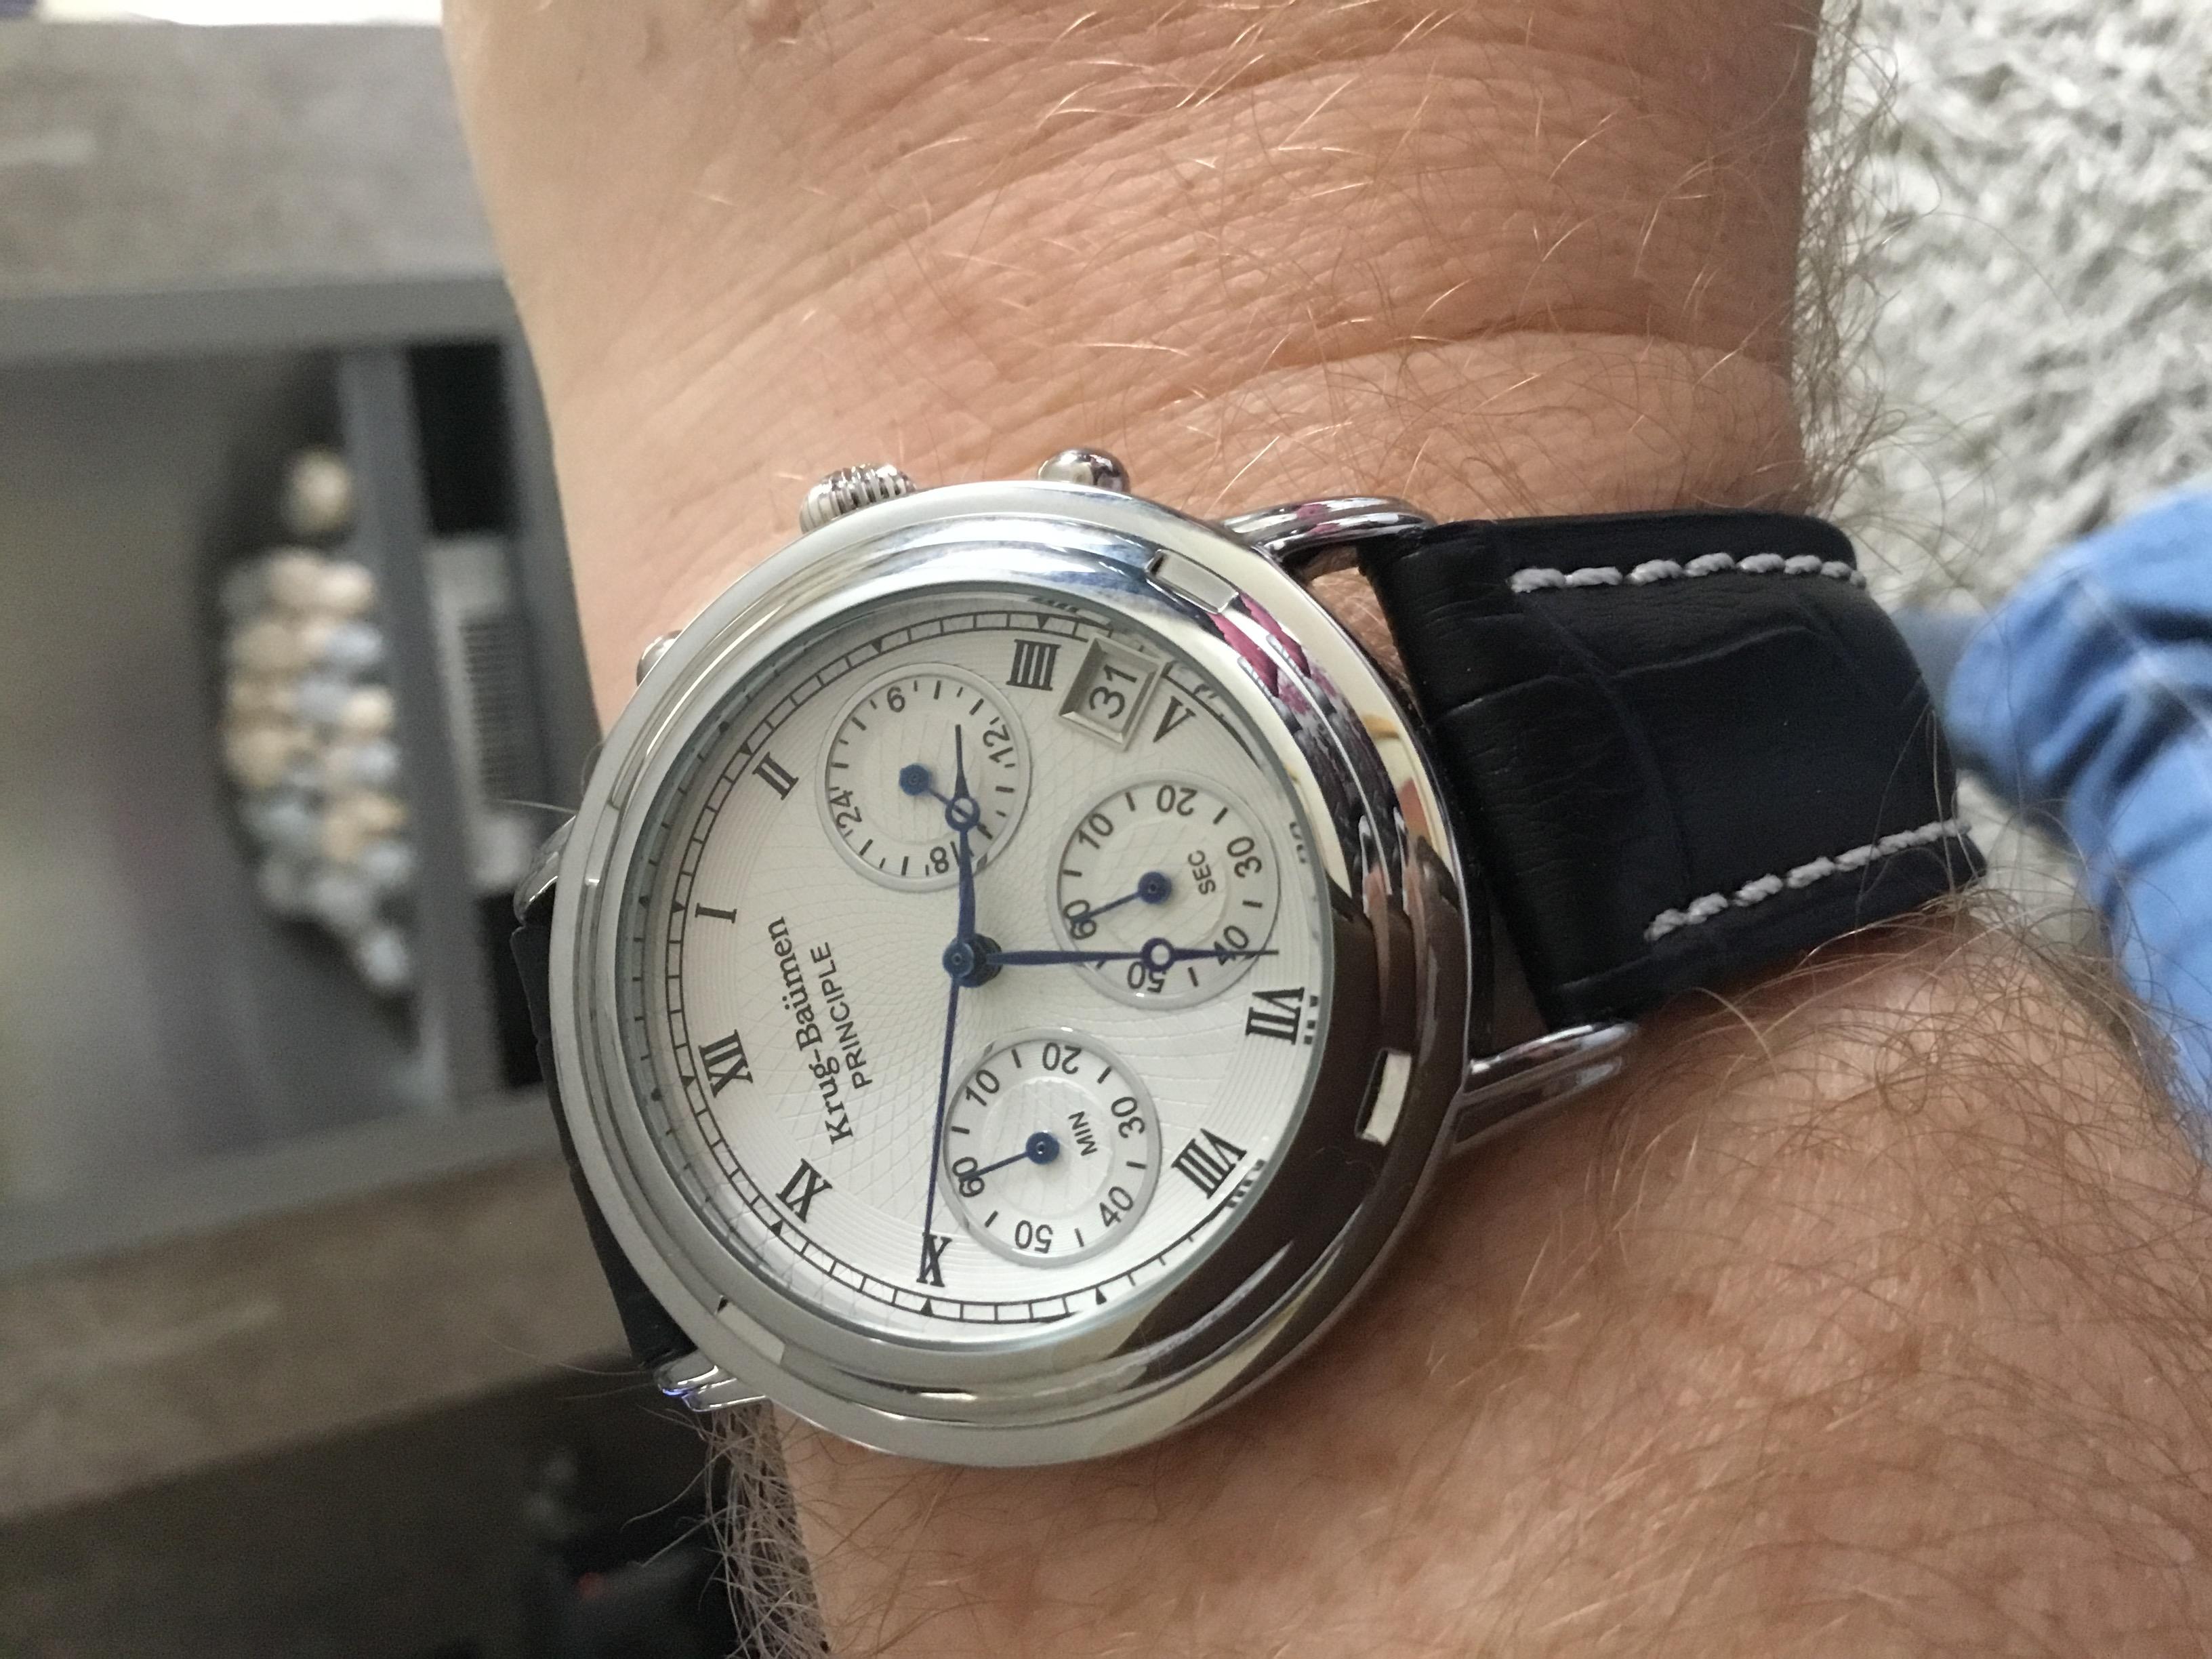 Model Krug-baumen 2011km Krug-baumen Principle Classic Mens Chronograph Watch Armbanduhren Armband- & Taschenuhren